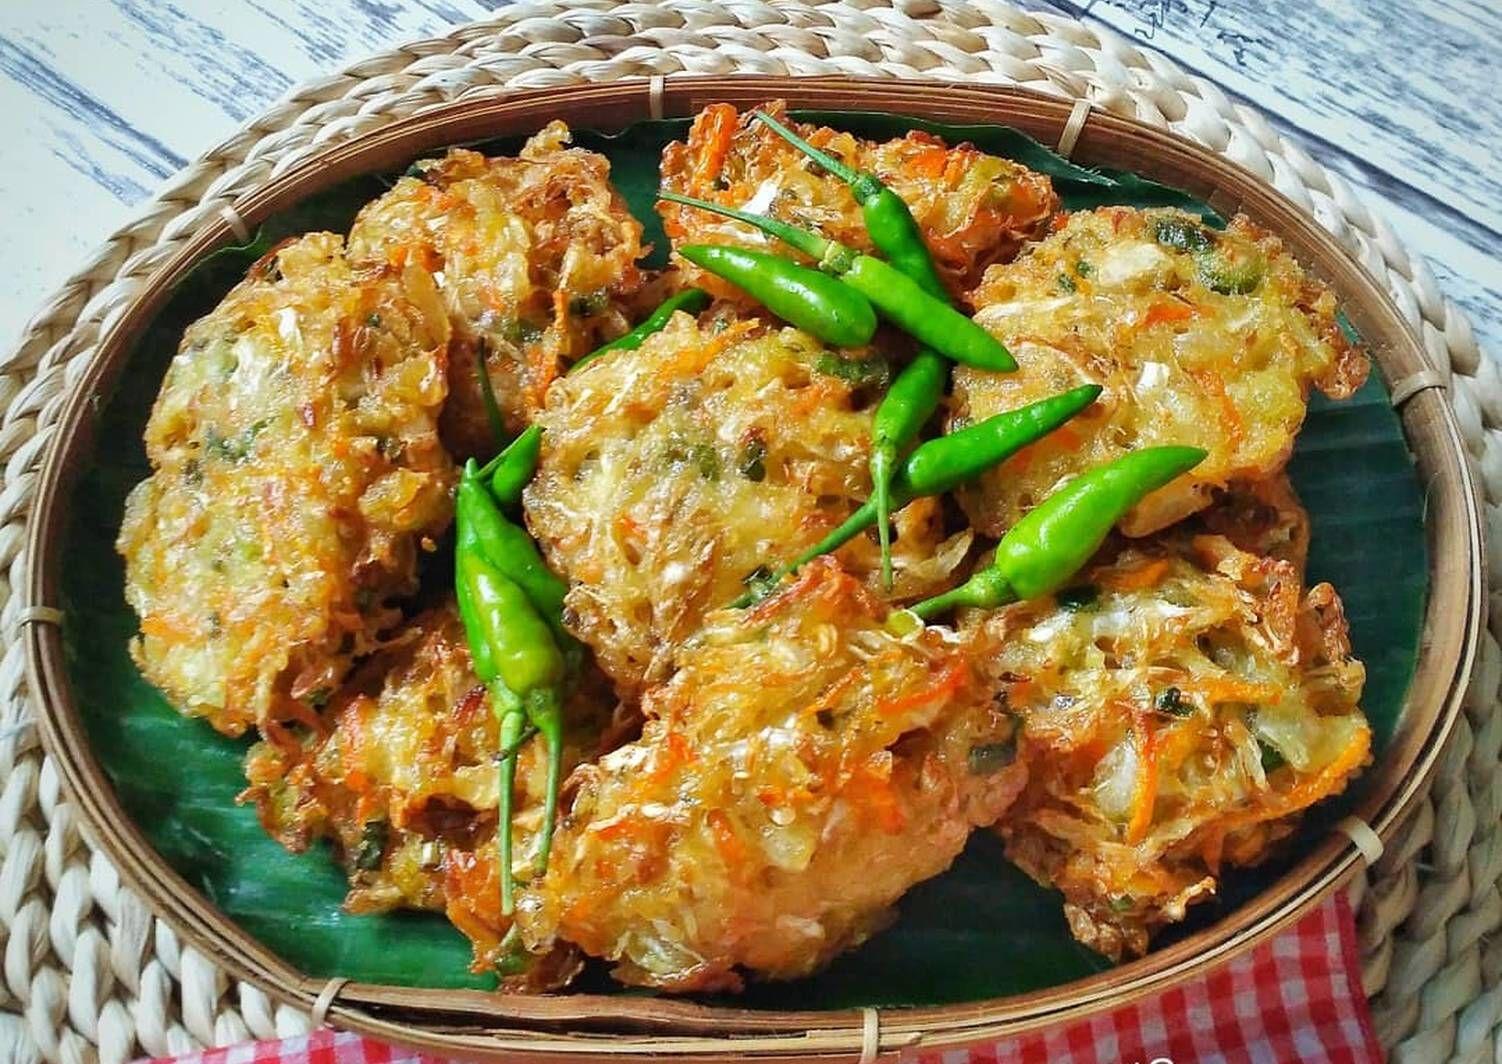 Resep Bakwan Sayur Bala Bala Oleh Susan Mellyani Resep Resep Sayuran Cemilan